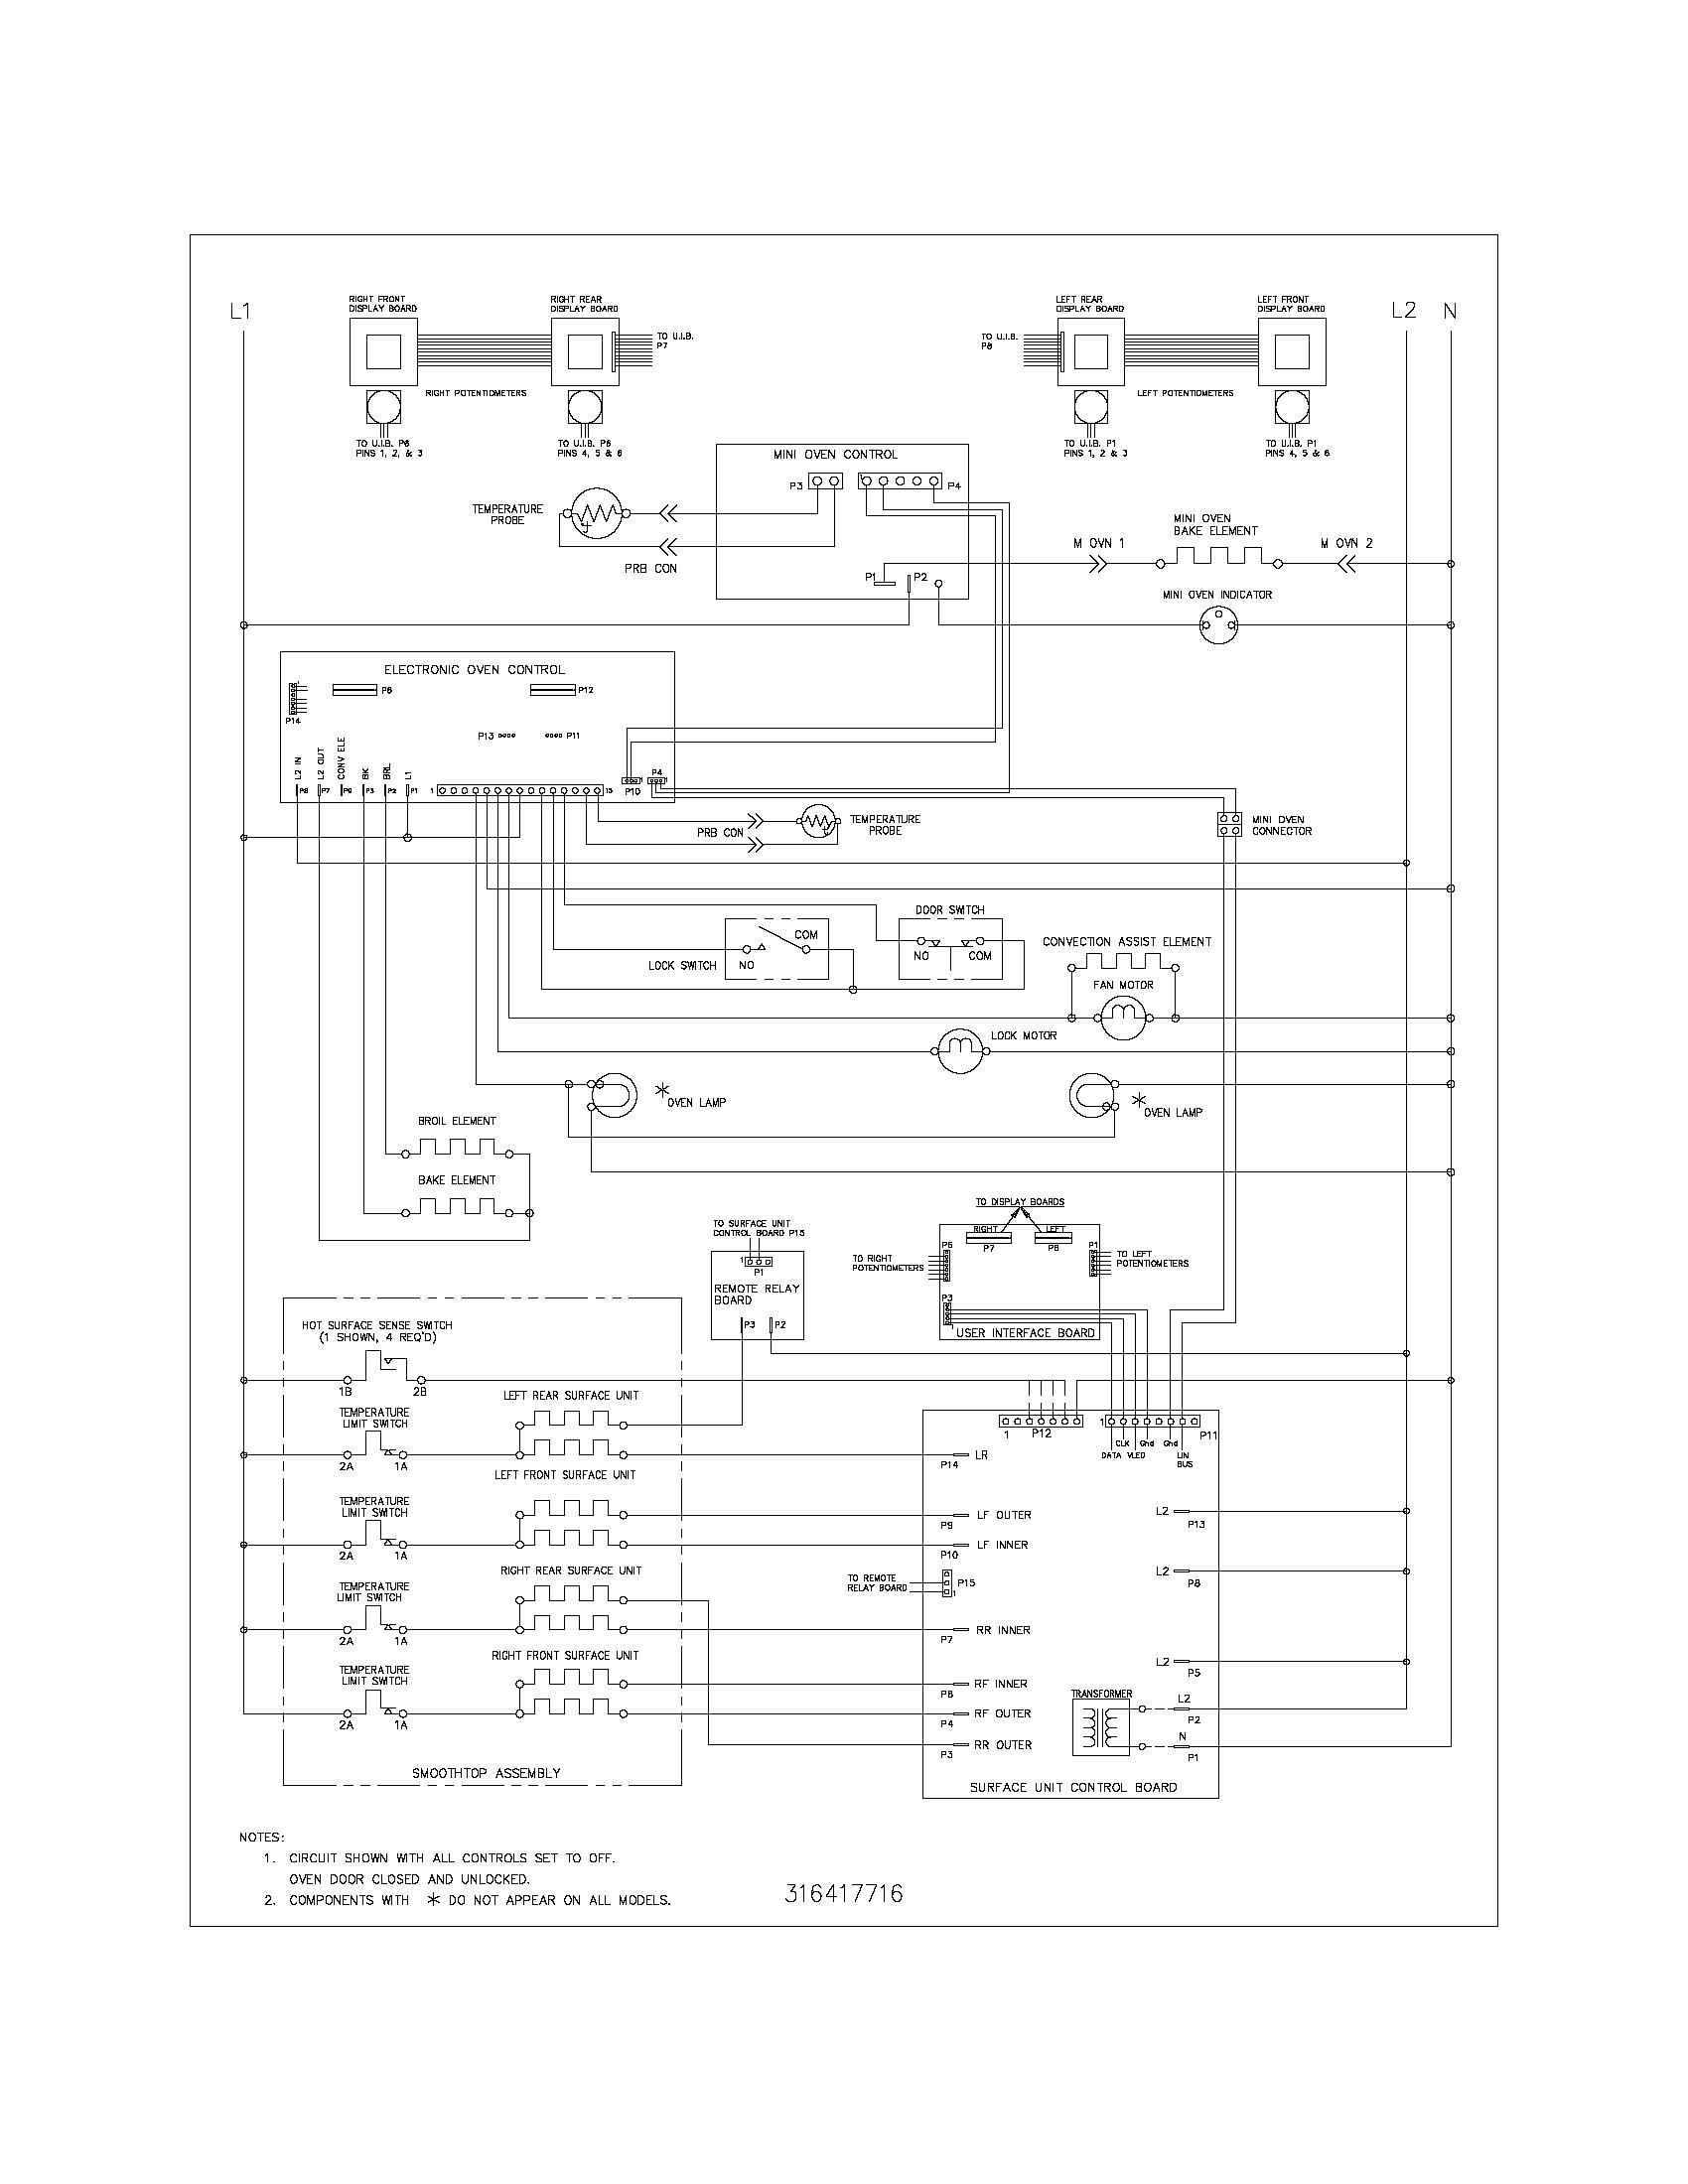 temco fireplace wiring diagram vw simple draw program Heat Surge Electric Fireplace Wiring-Diagram electric fireplace wiring diagram